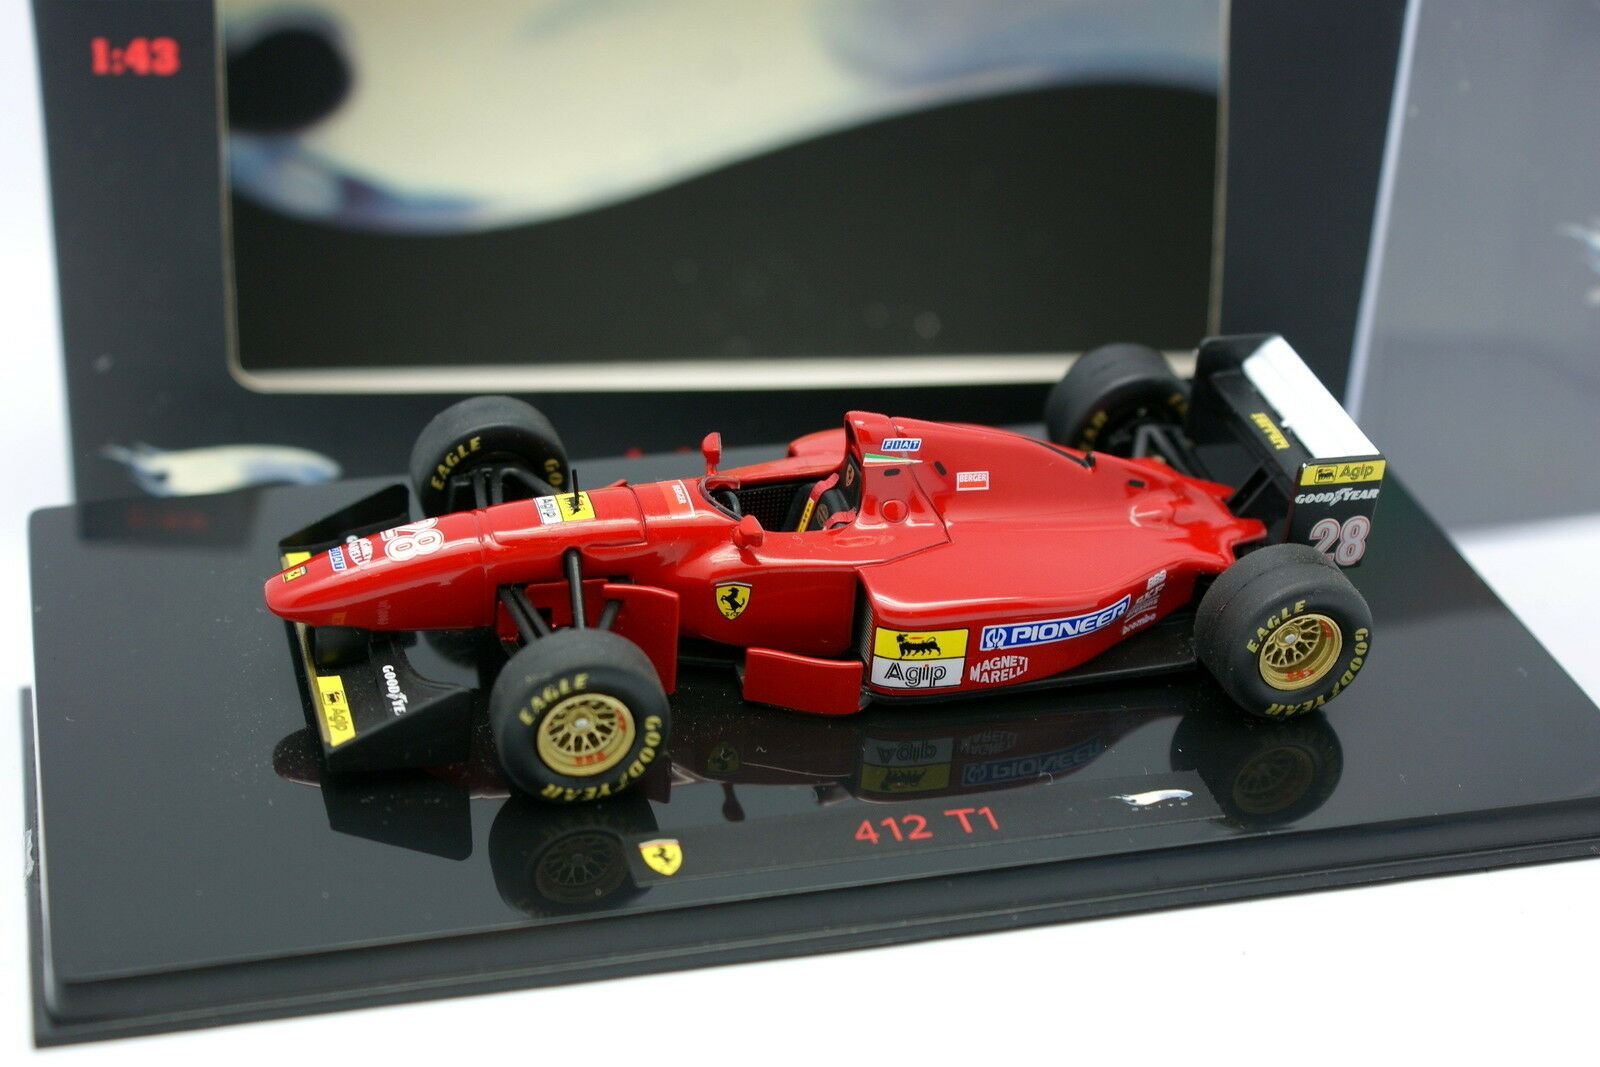 Hot Wheels 1 43 - F1 Ferrari Ferrari Ferrari 412 T1 e0b0c5